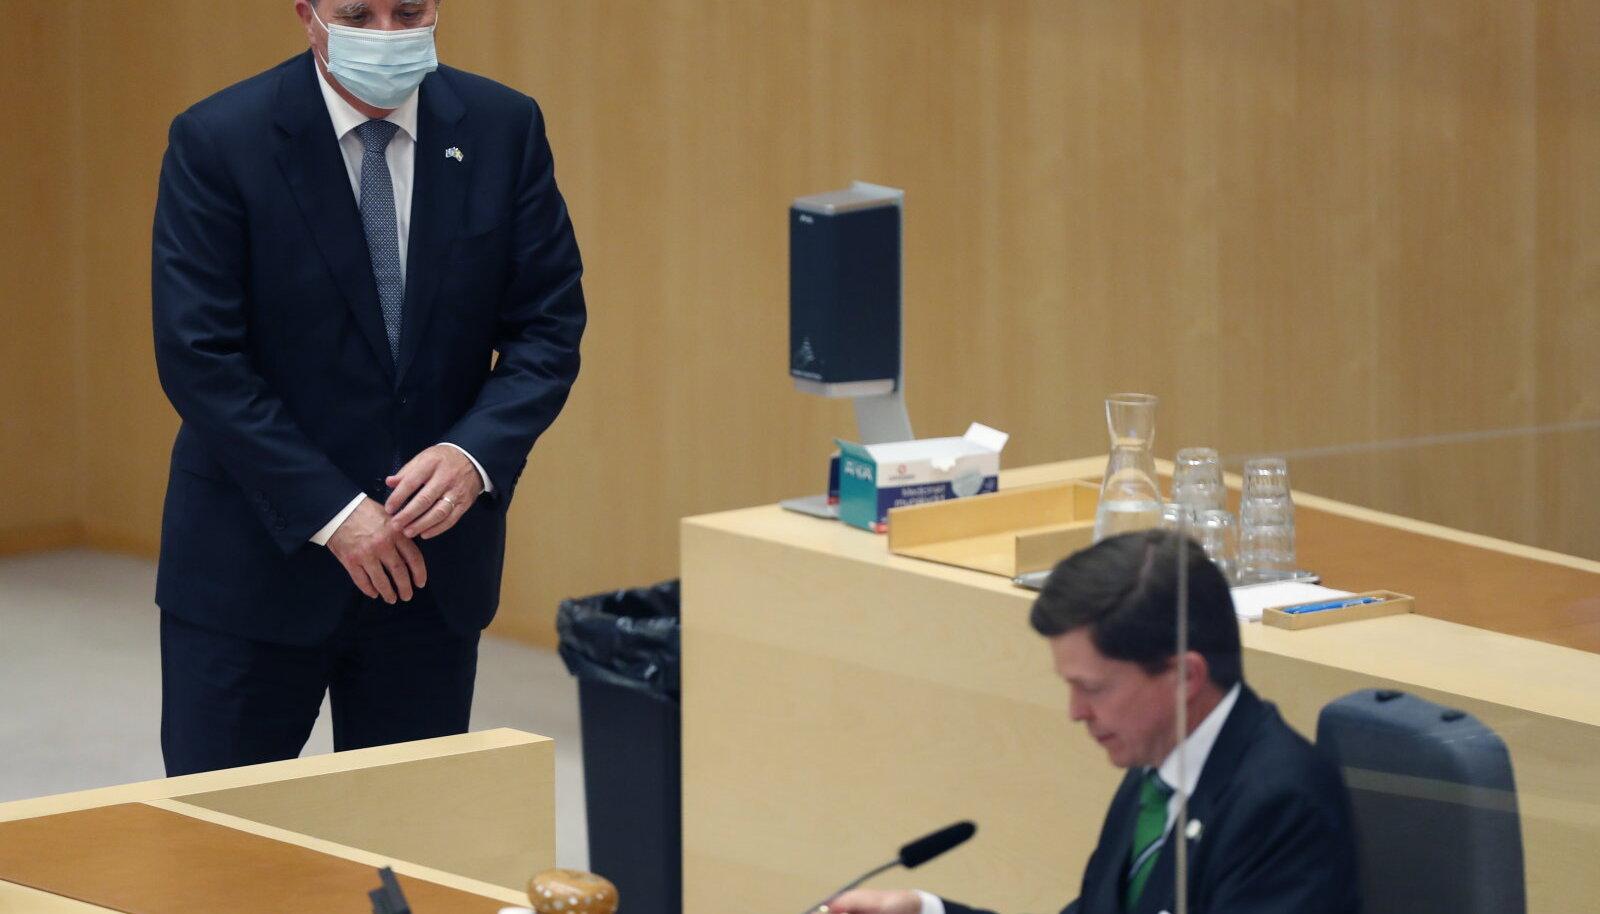 Stefan Löfven ja parlamendi spiiker Andreas Norlén